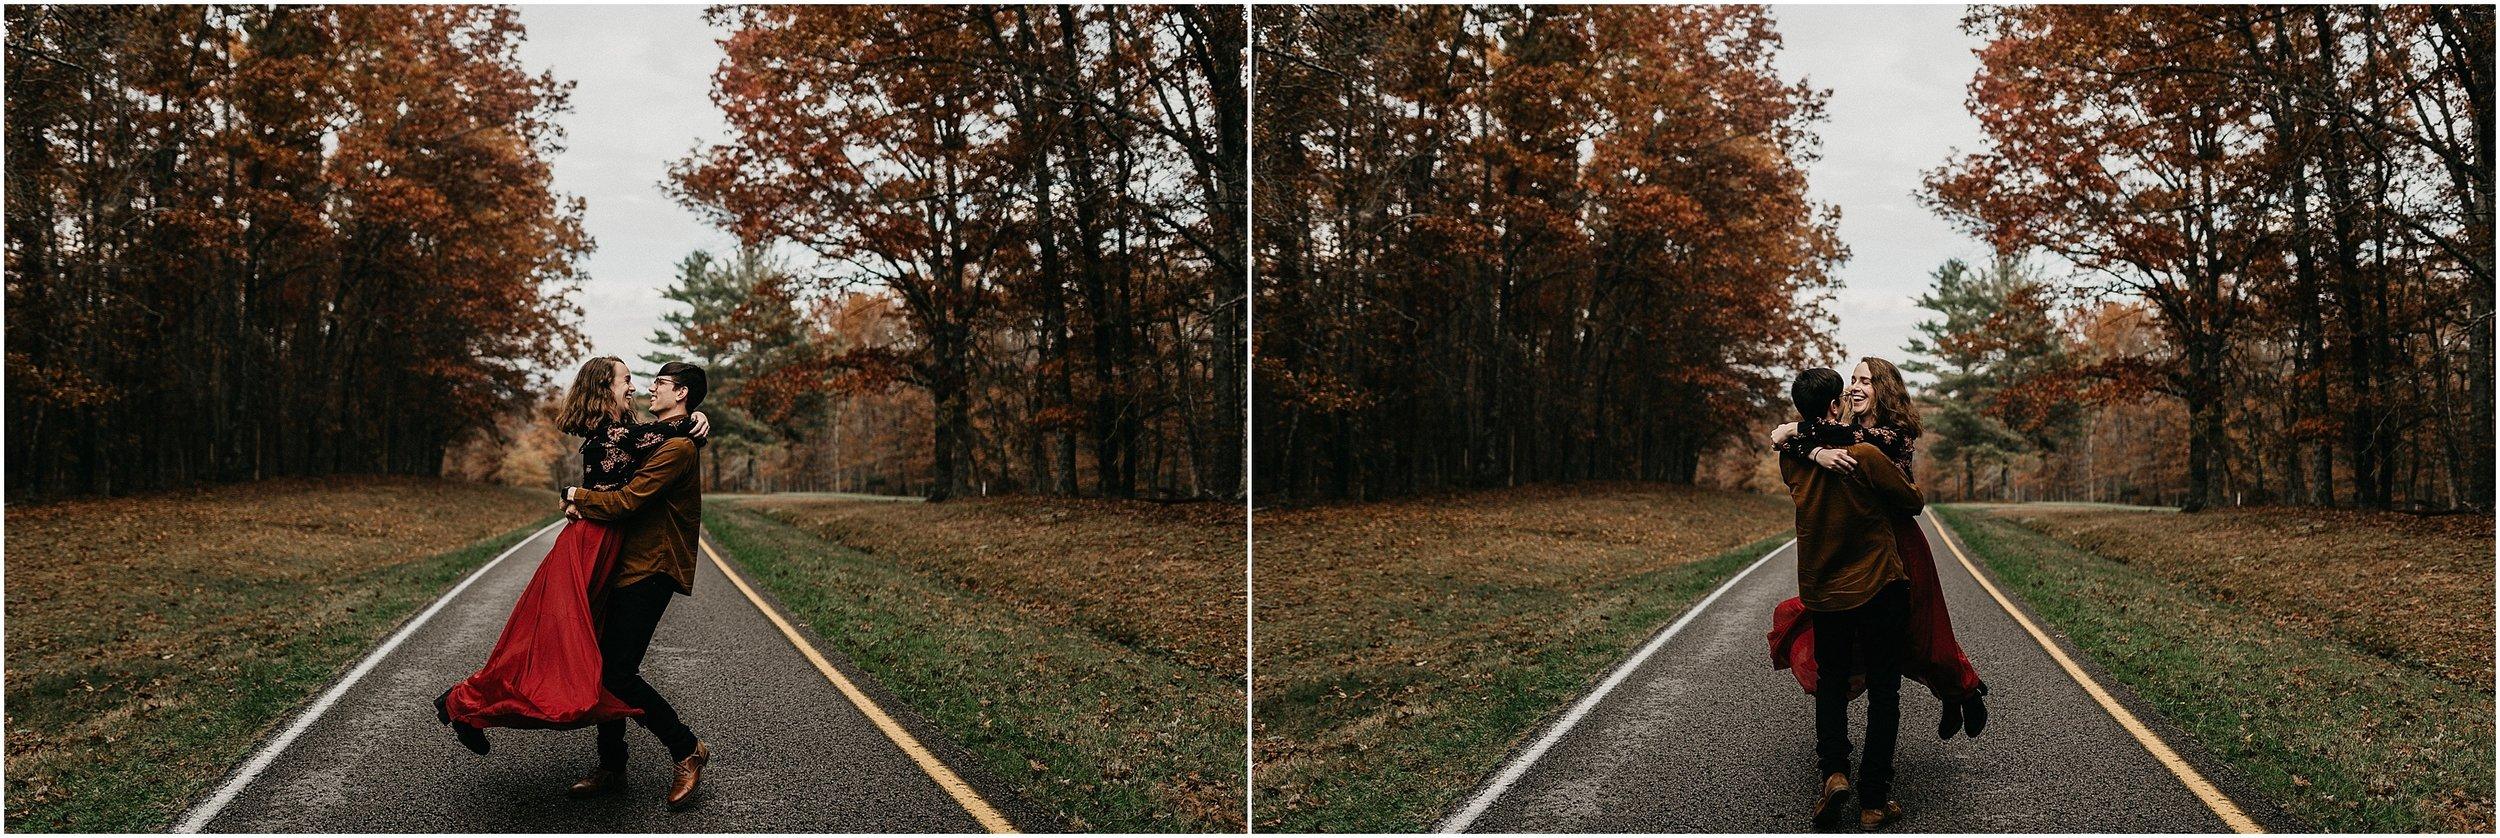 Chattanooga-Autumn-Engagement-26.jpg